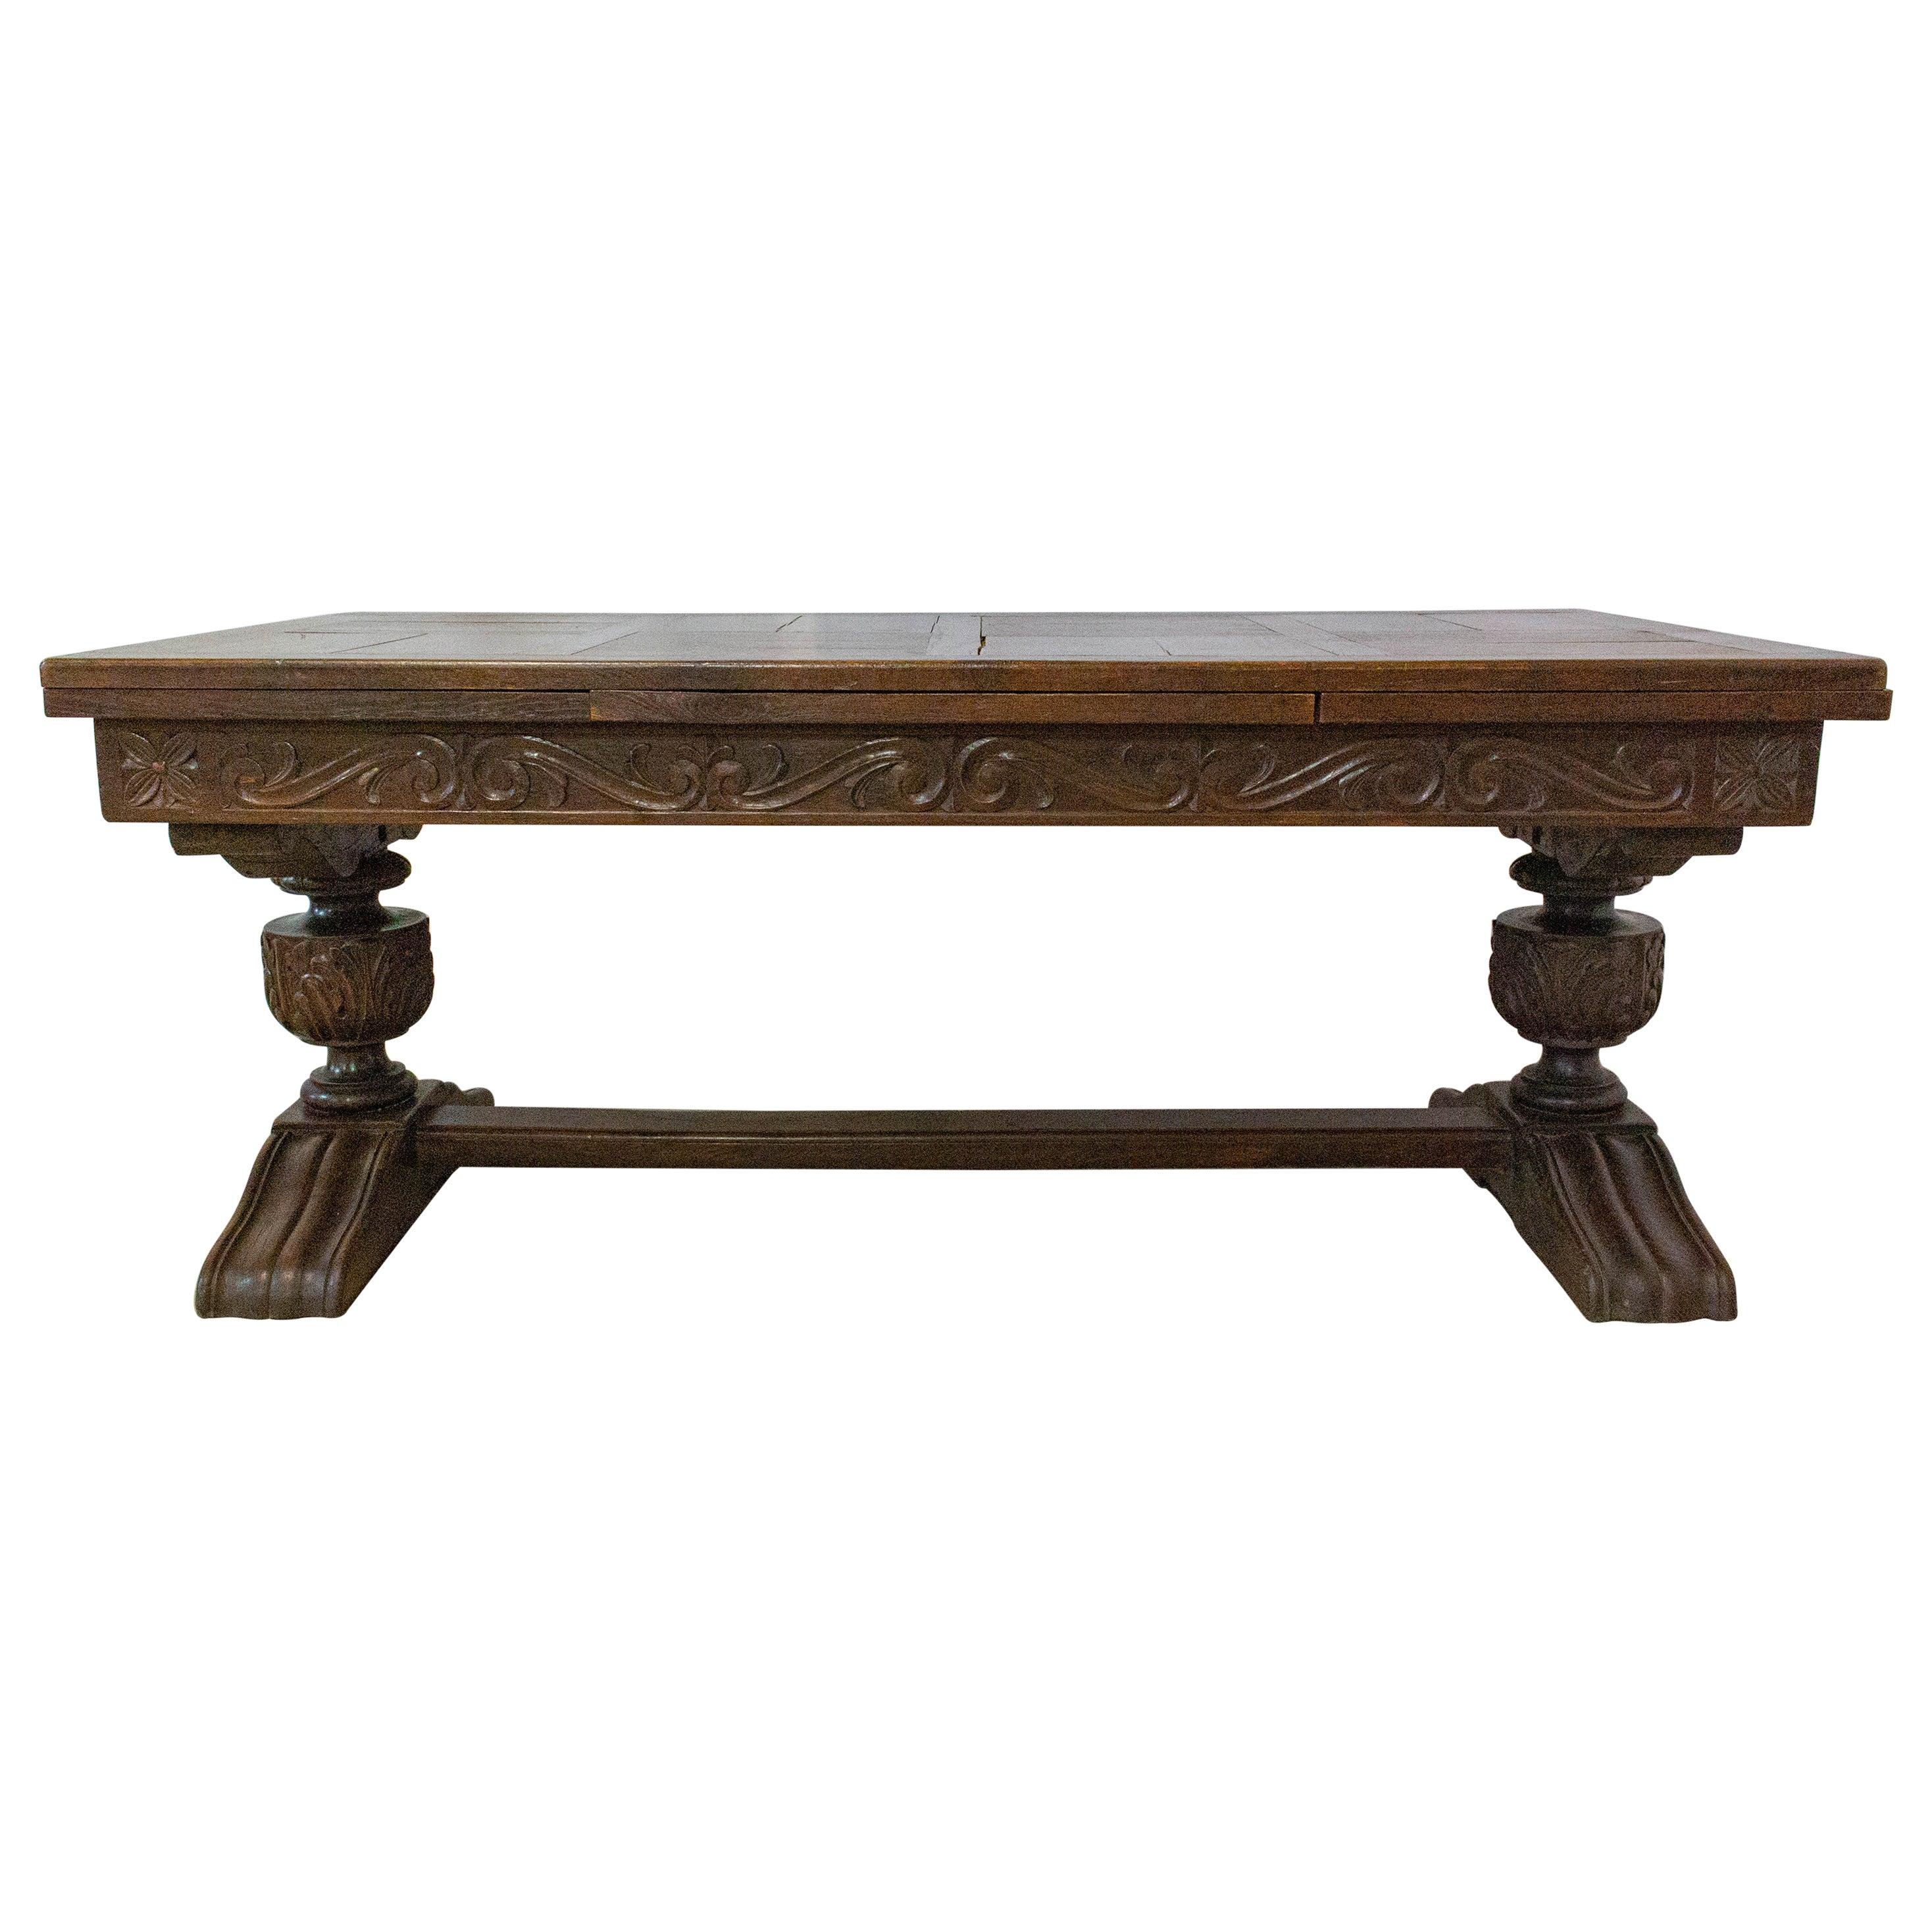 Oak Dining Table Basque Spanish Renaissance Revival Refectory Extends Midcentury